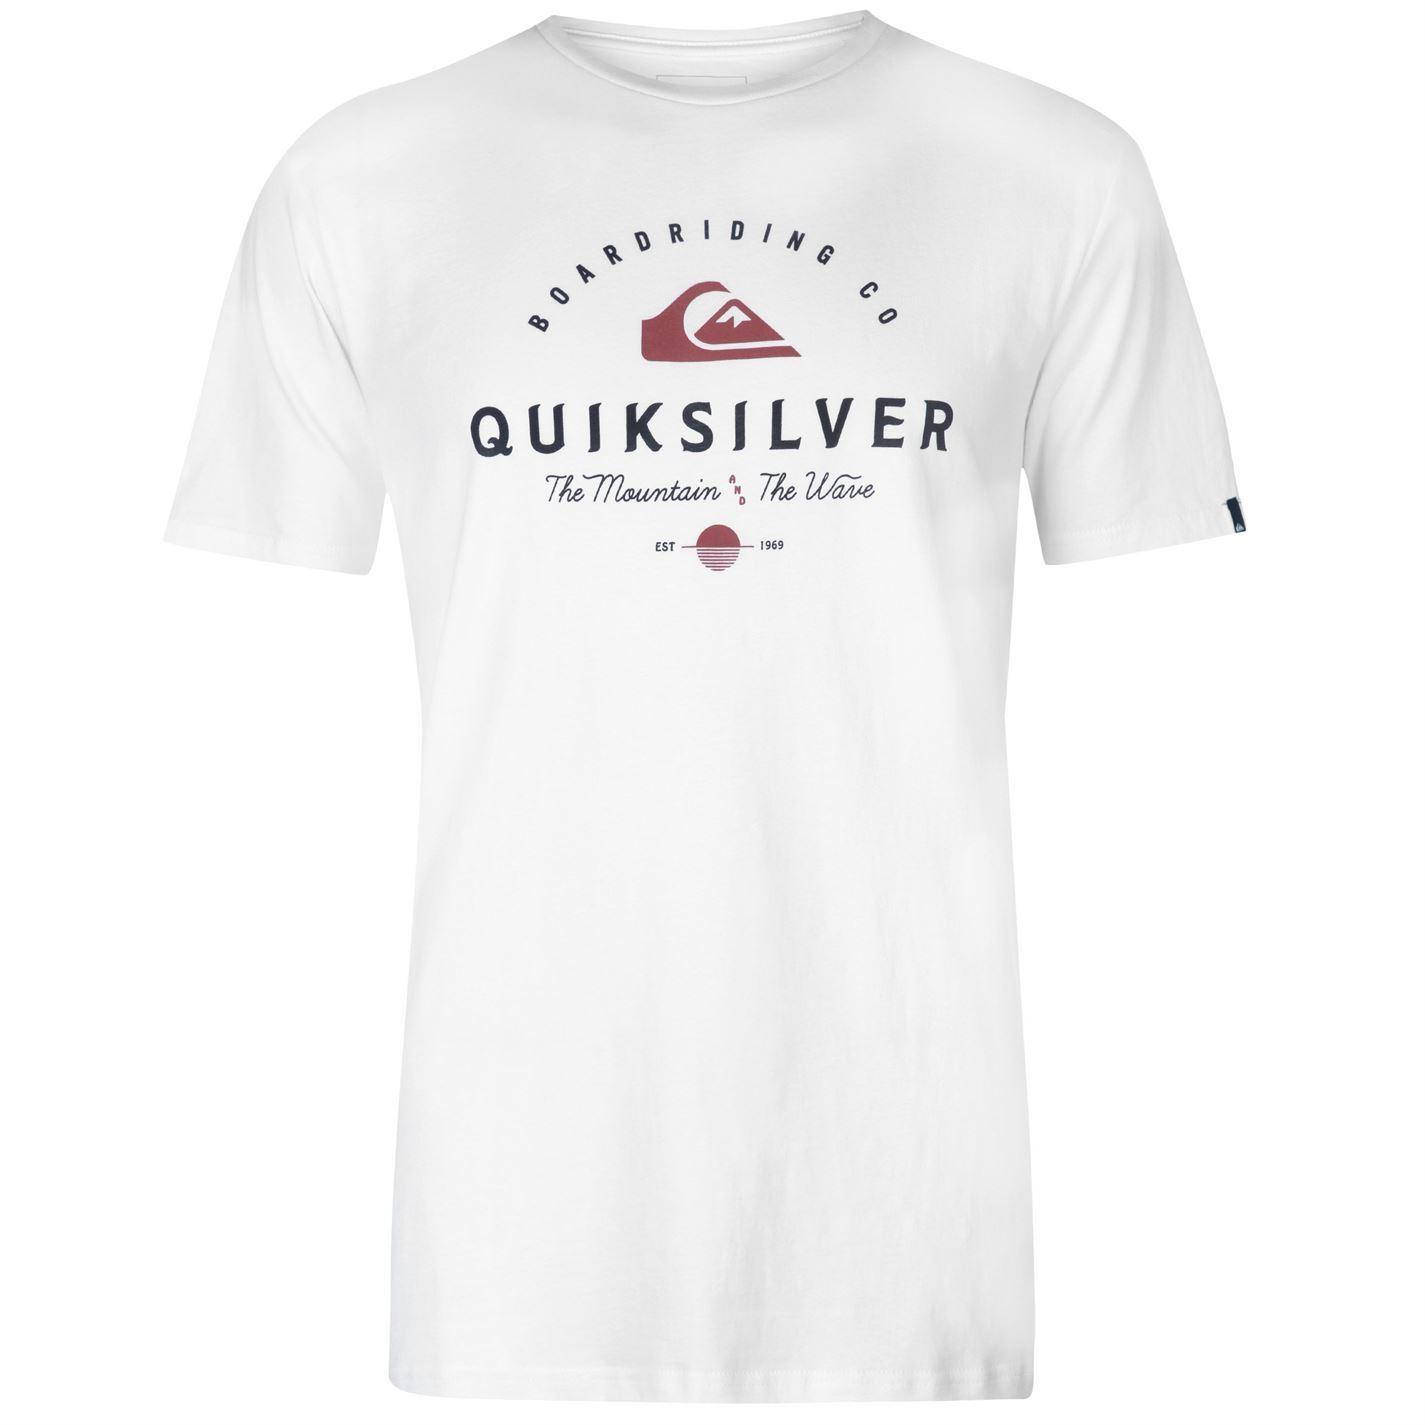 Quiksilver-Working-Man-T-Shirt-Mens-Tee-Shirt-Top thumbnail 8